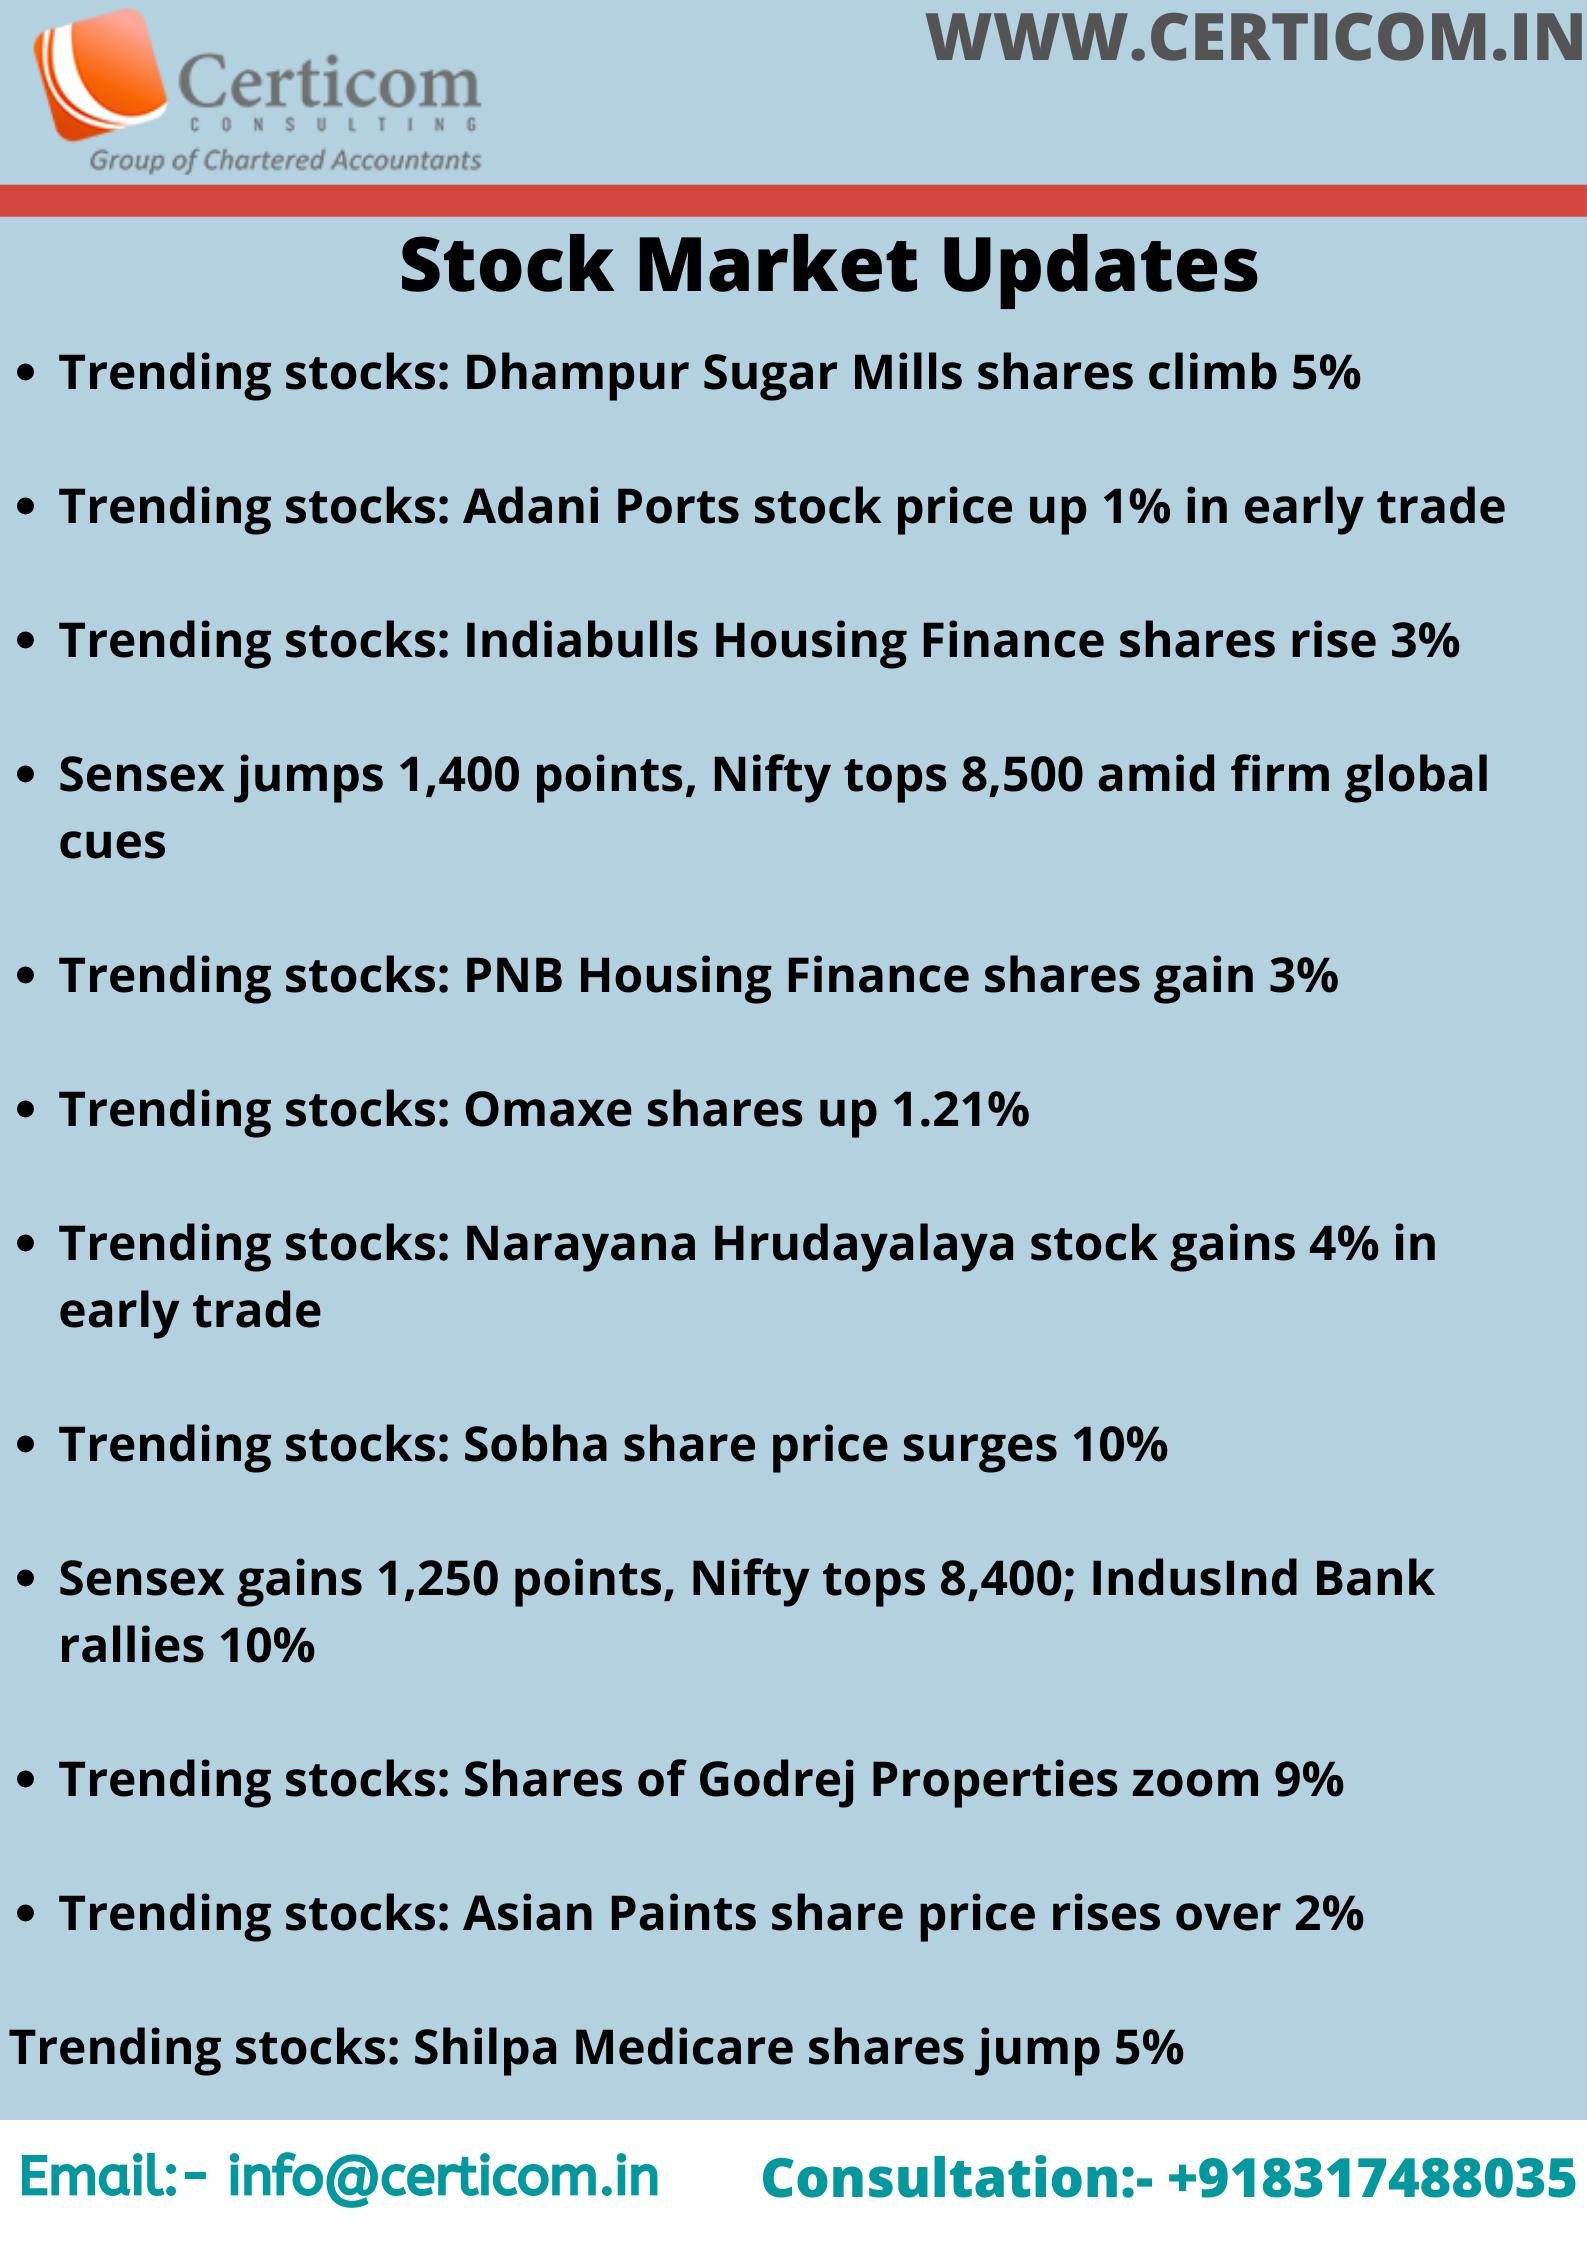 Stock Market Updates Stock Market Stock Prices Marketing